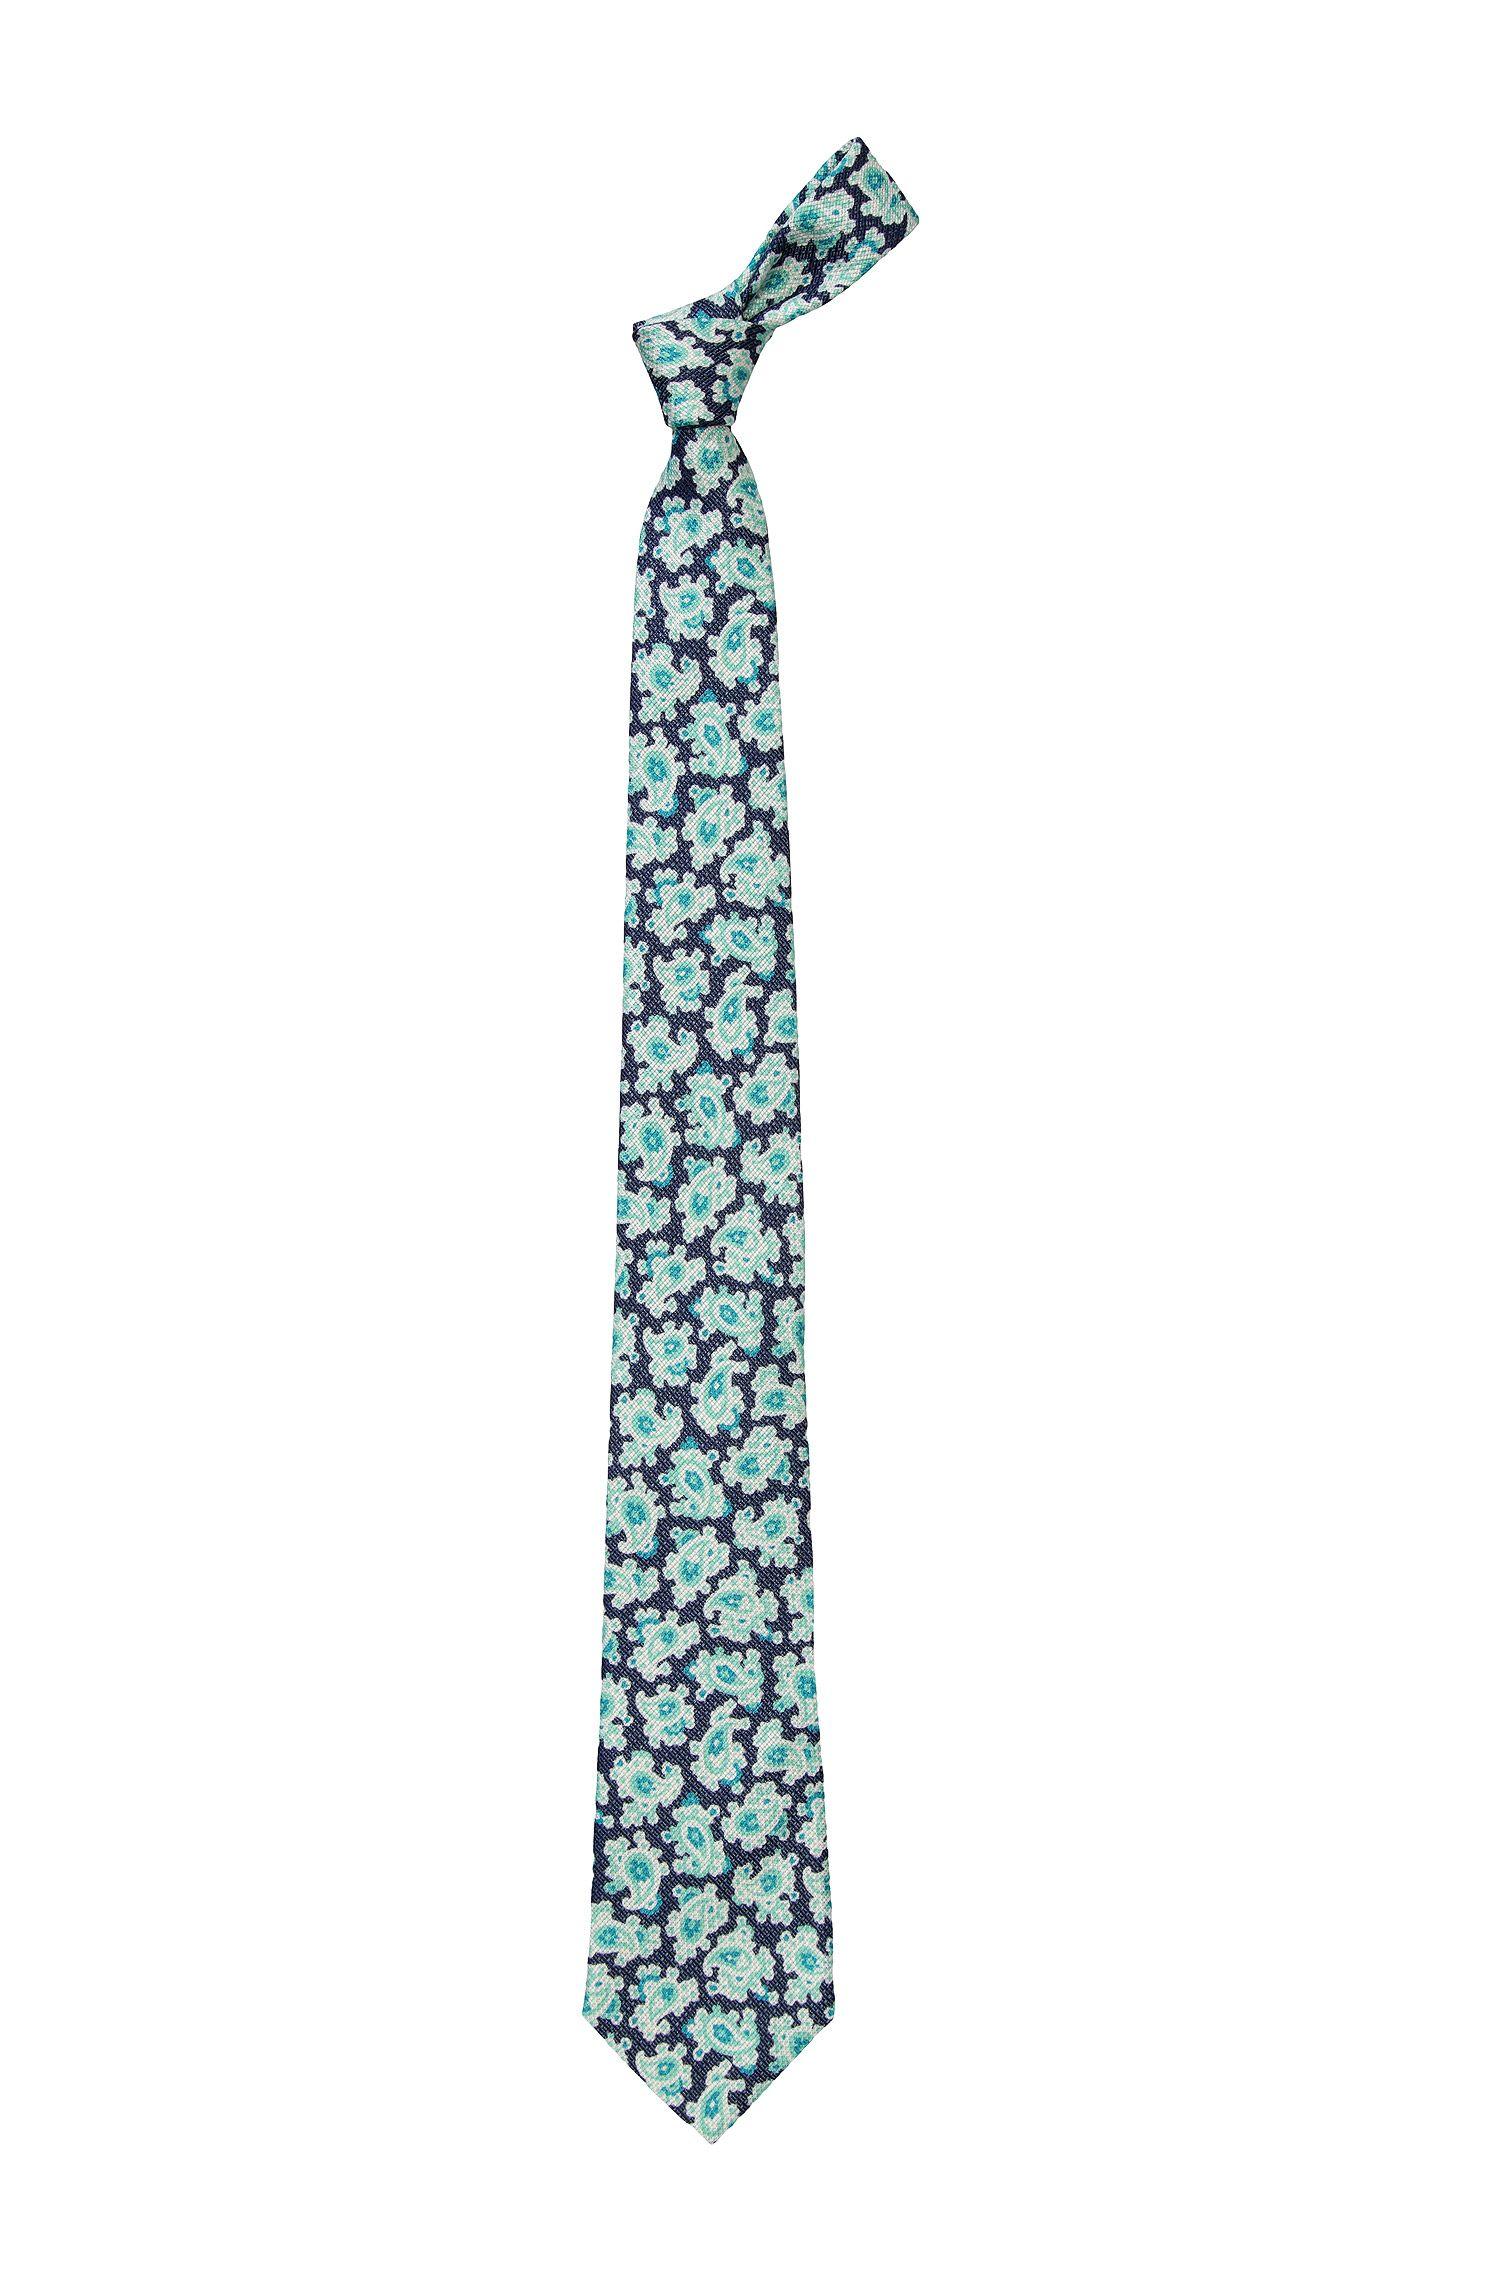 Cravate en soie, TIE CM 8